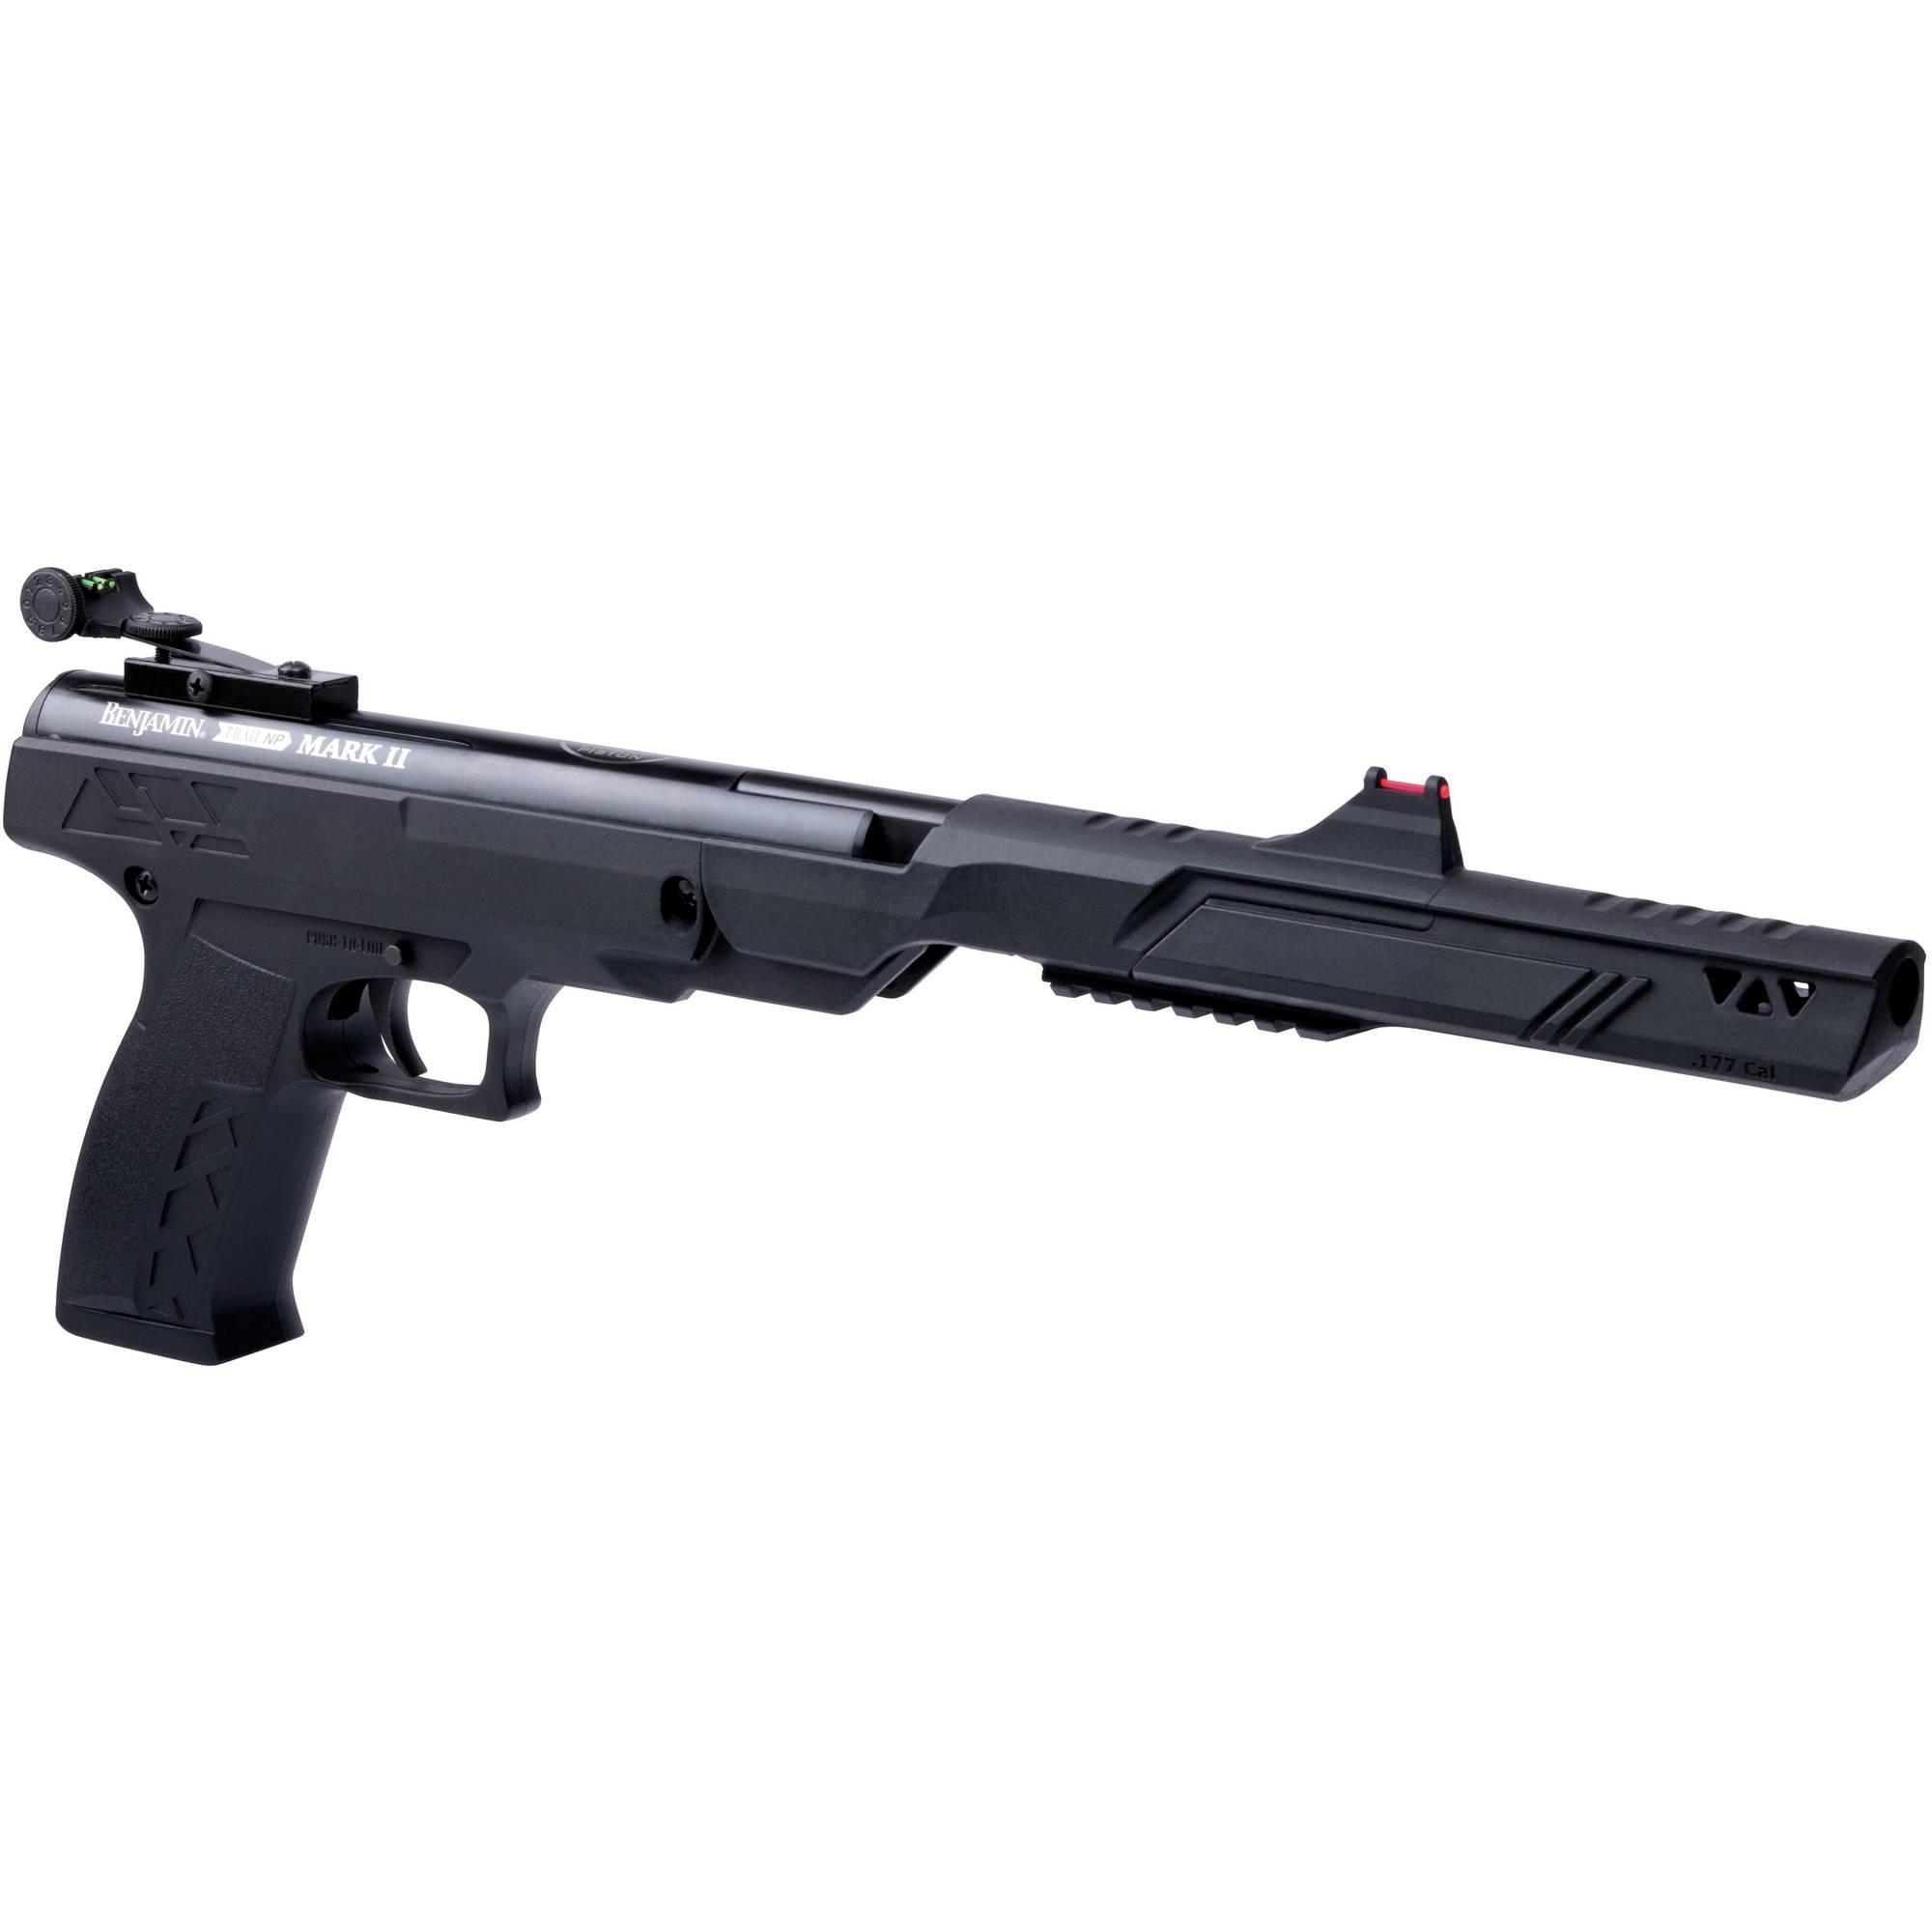 Benjamin Trial NP Mark II .177 Caliber Break Barrel Air Pistol, 625fps by